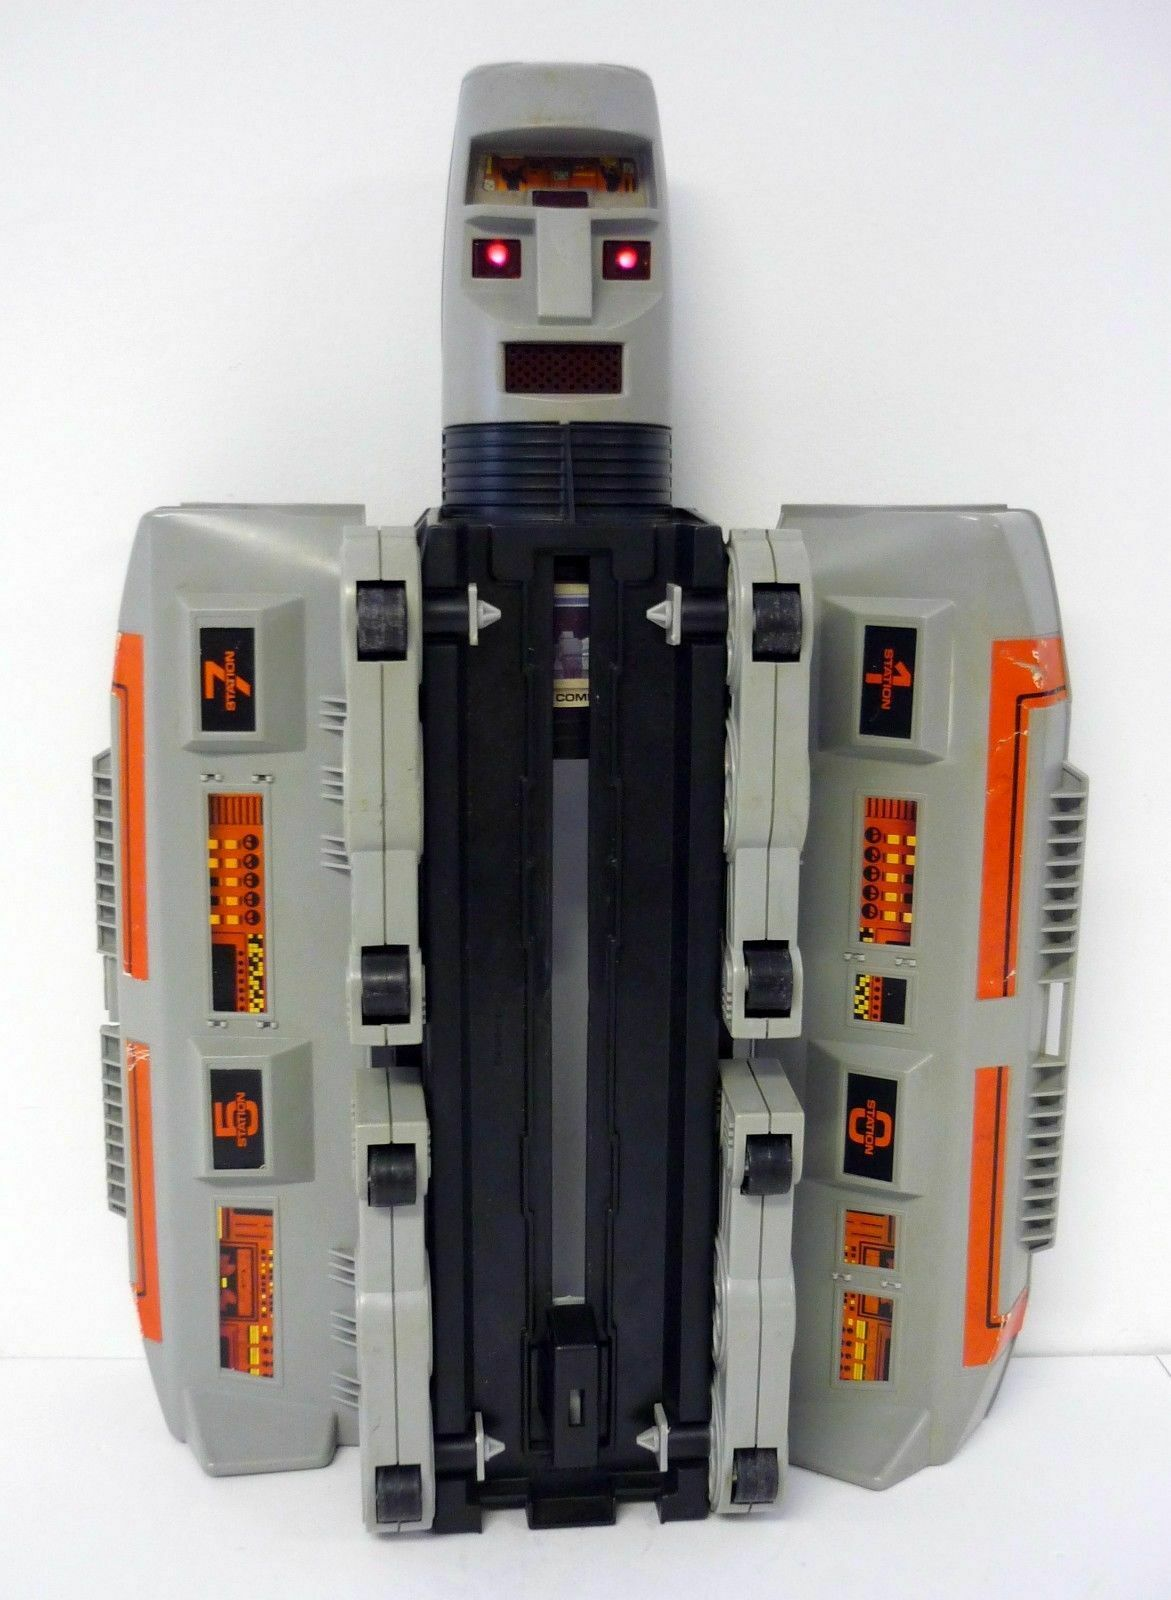 GO BOTS COMMAND CENTER FORTRESS Bandai Tonka Robot Playset Playset Playset NEAR COMPLETE 1984 269c3d